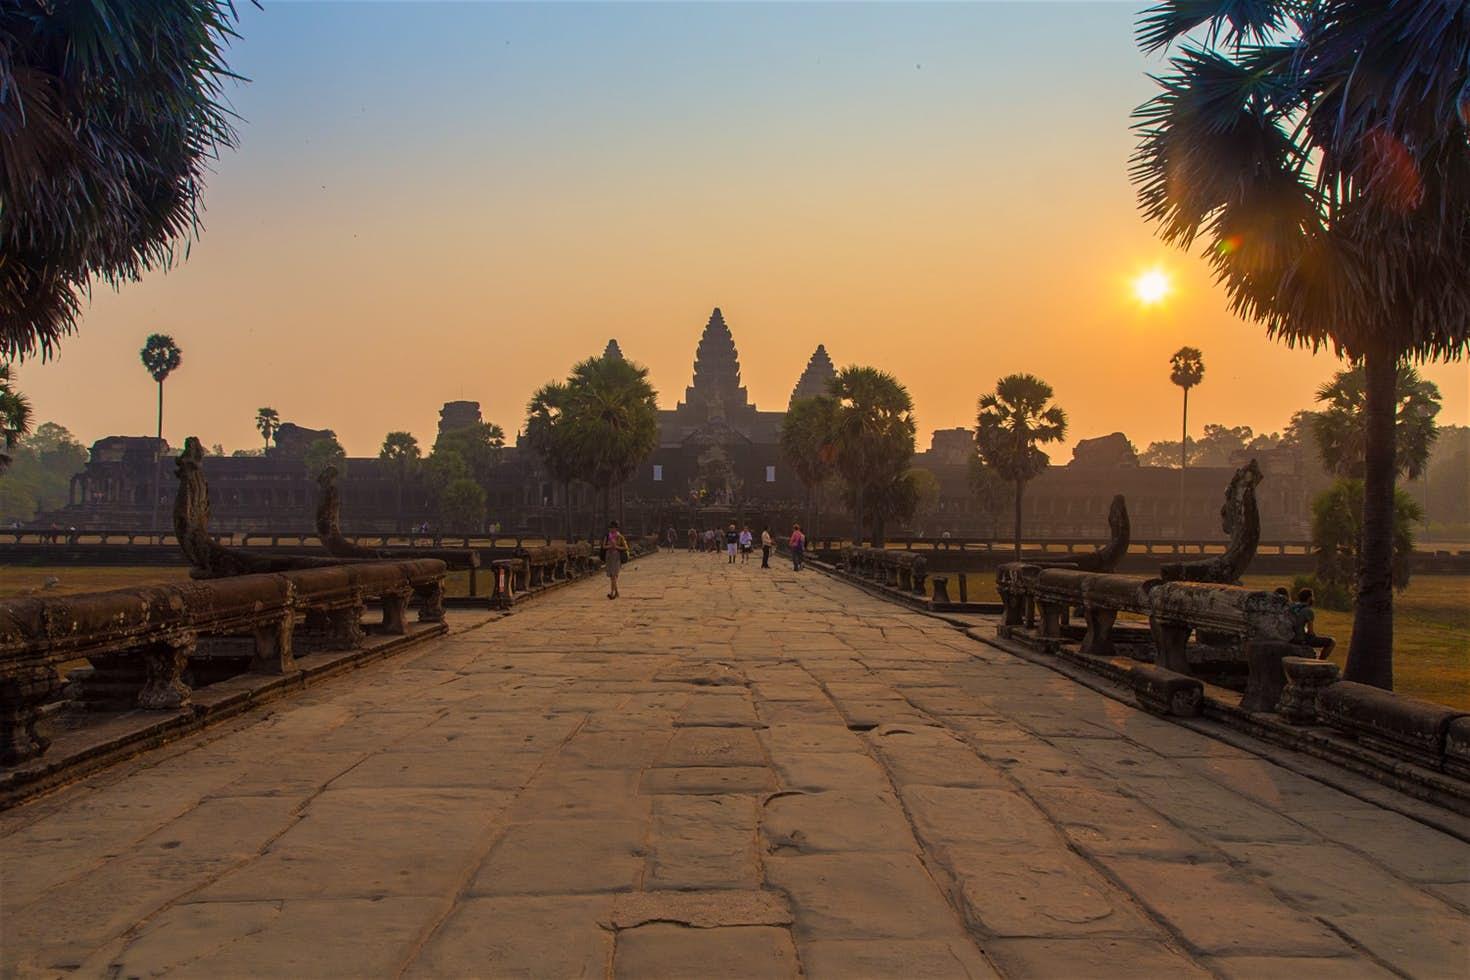 1. Angkor Wat (Angkor Archaeological Park)